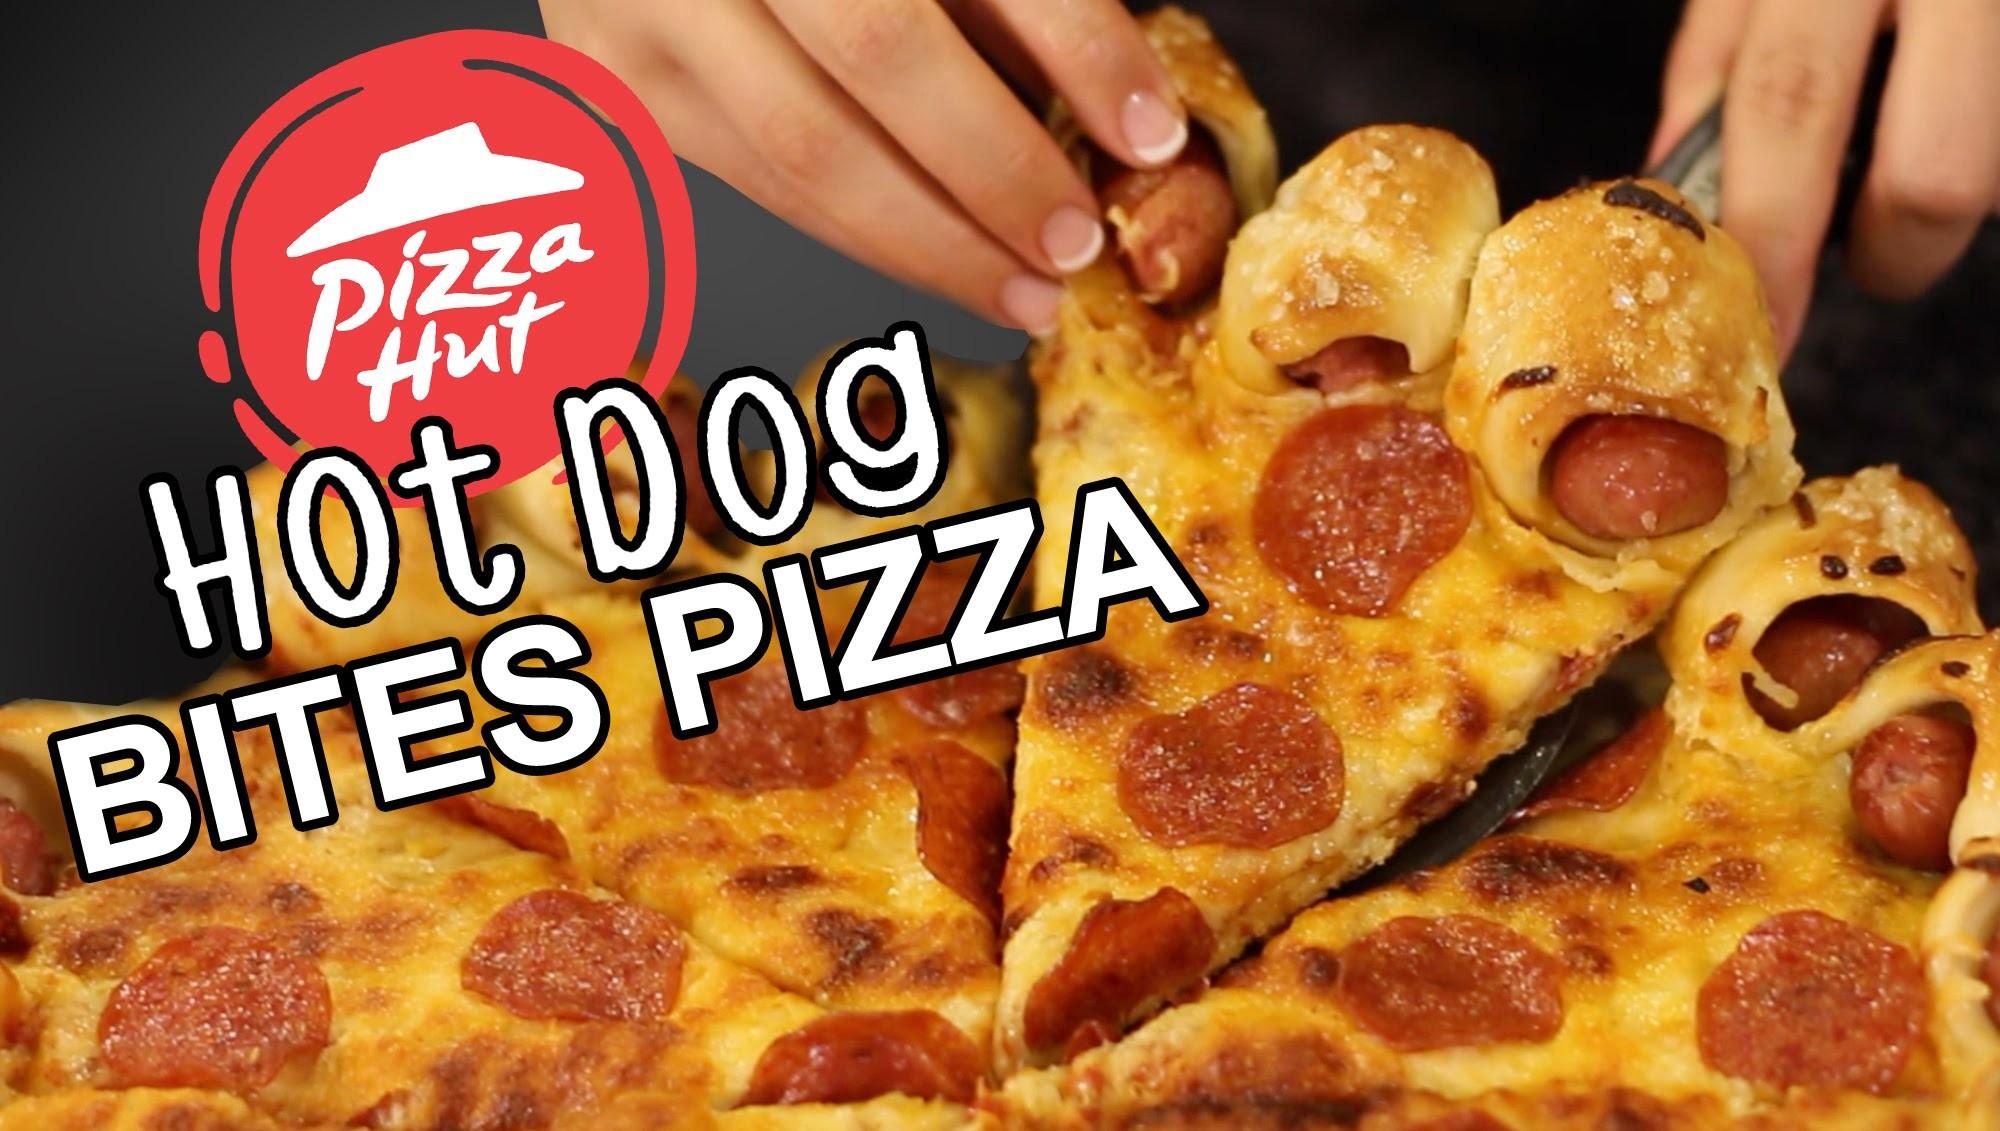 Pizza Hut Hot Dog Bites Crust Recipe Remake  |  HellthyJunkFood